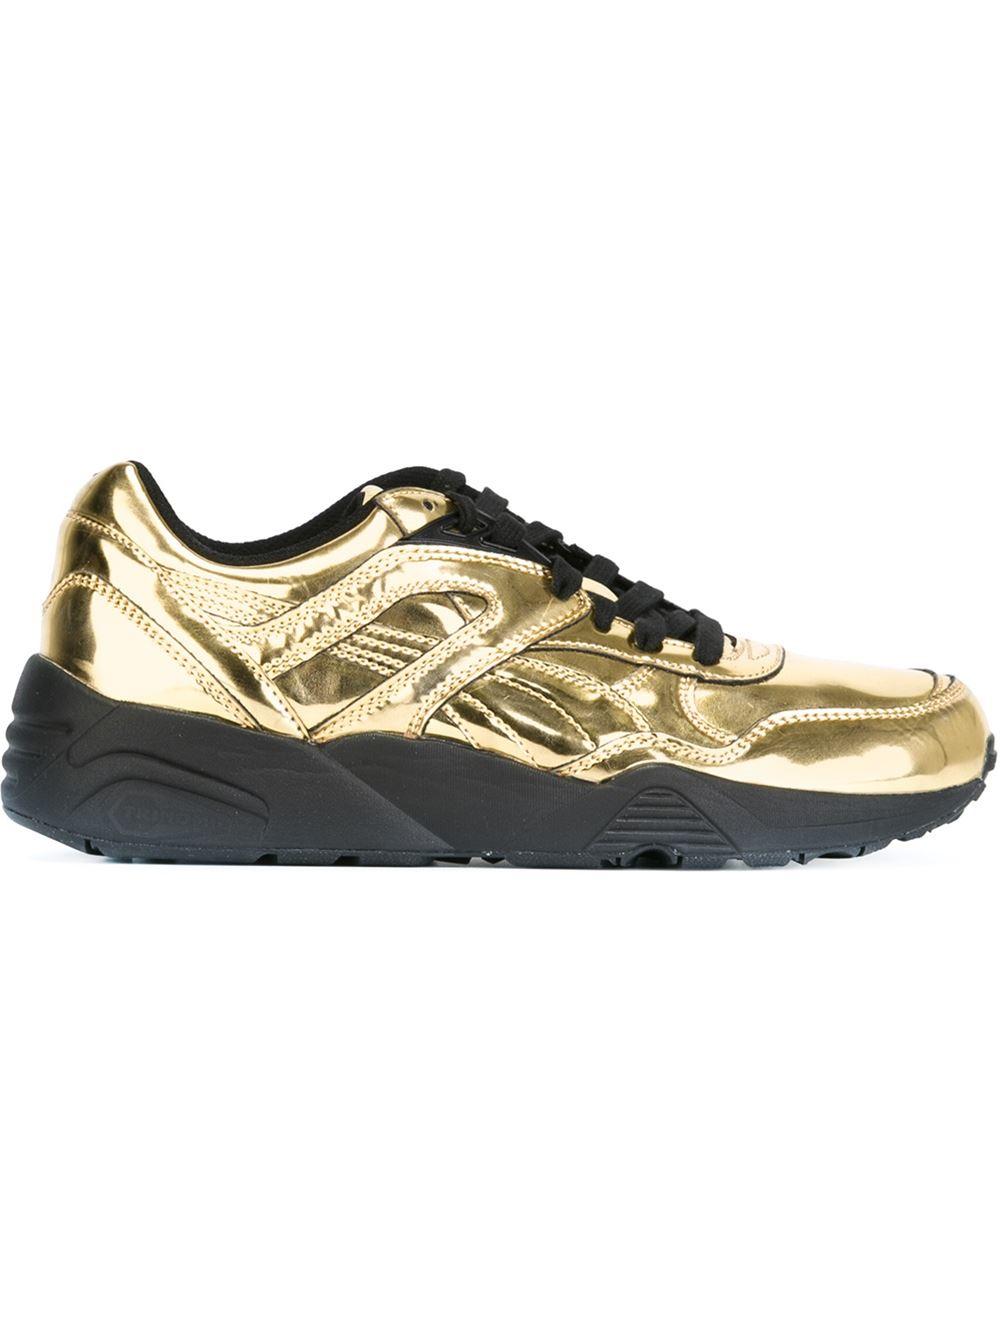 Saint Laurent Metallic Shoes Mens